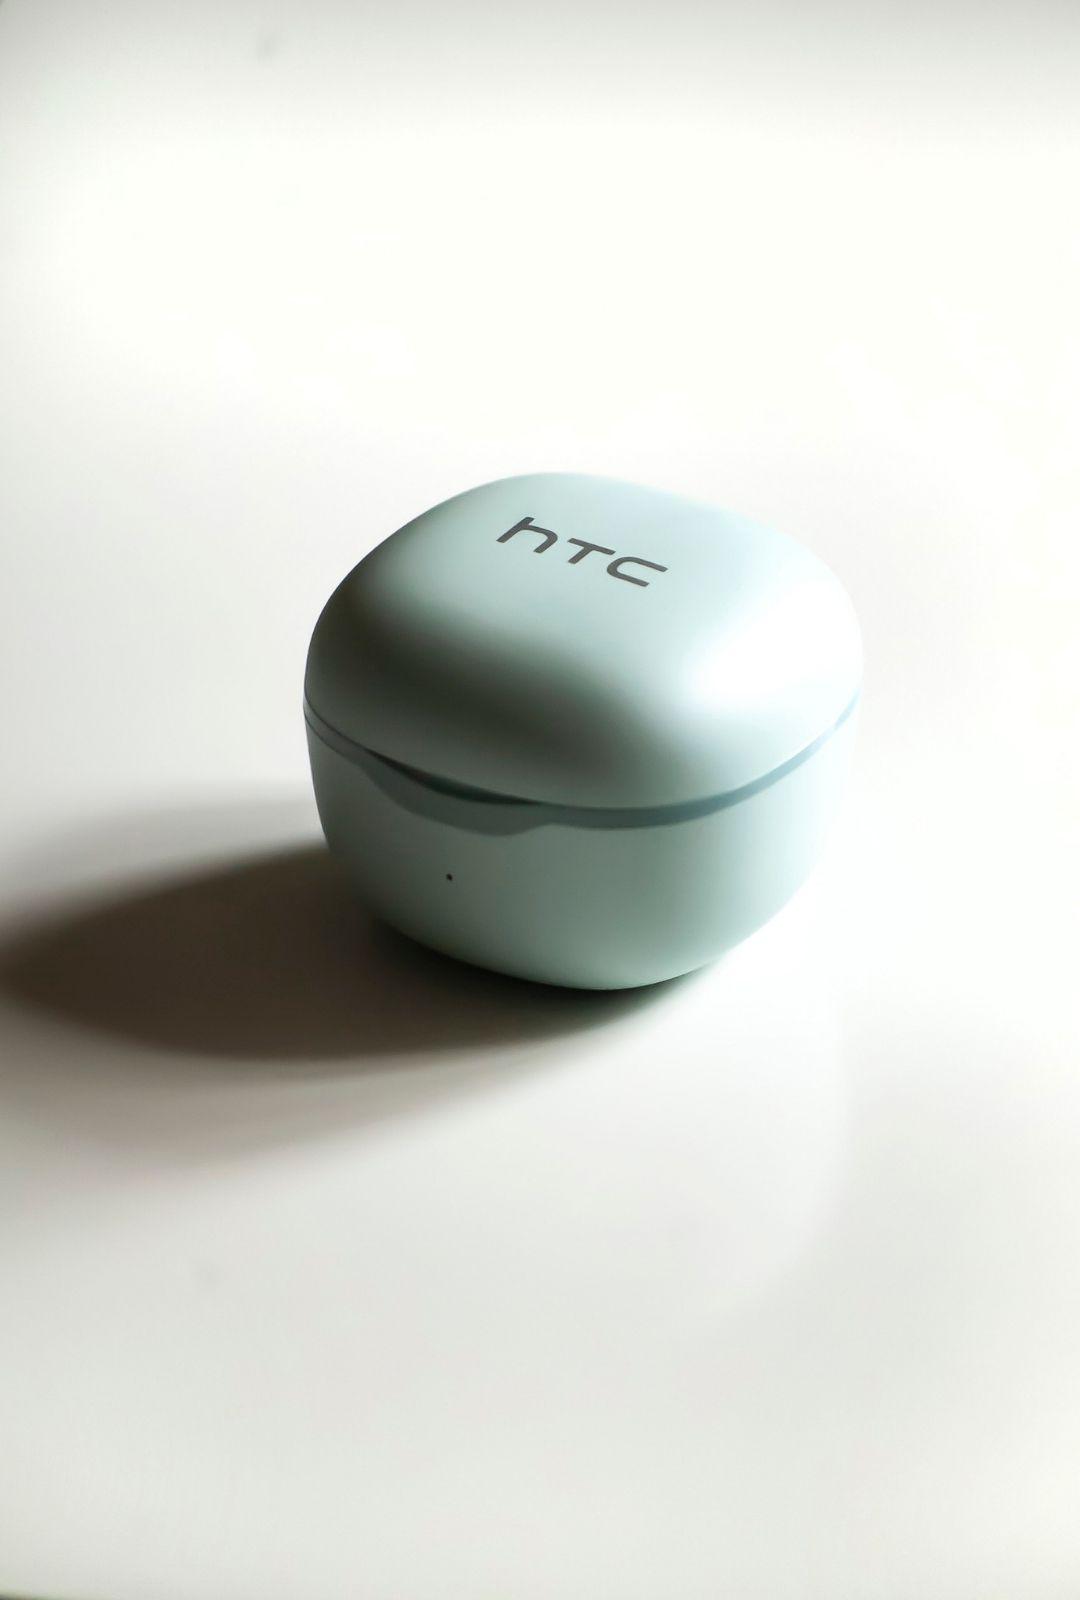 HTC Wireless Earbuds